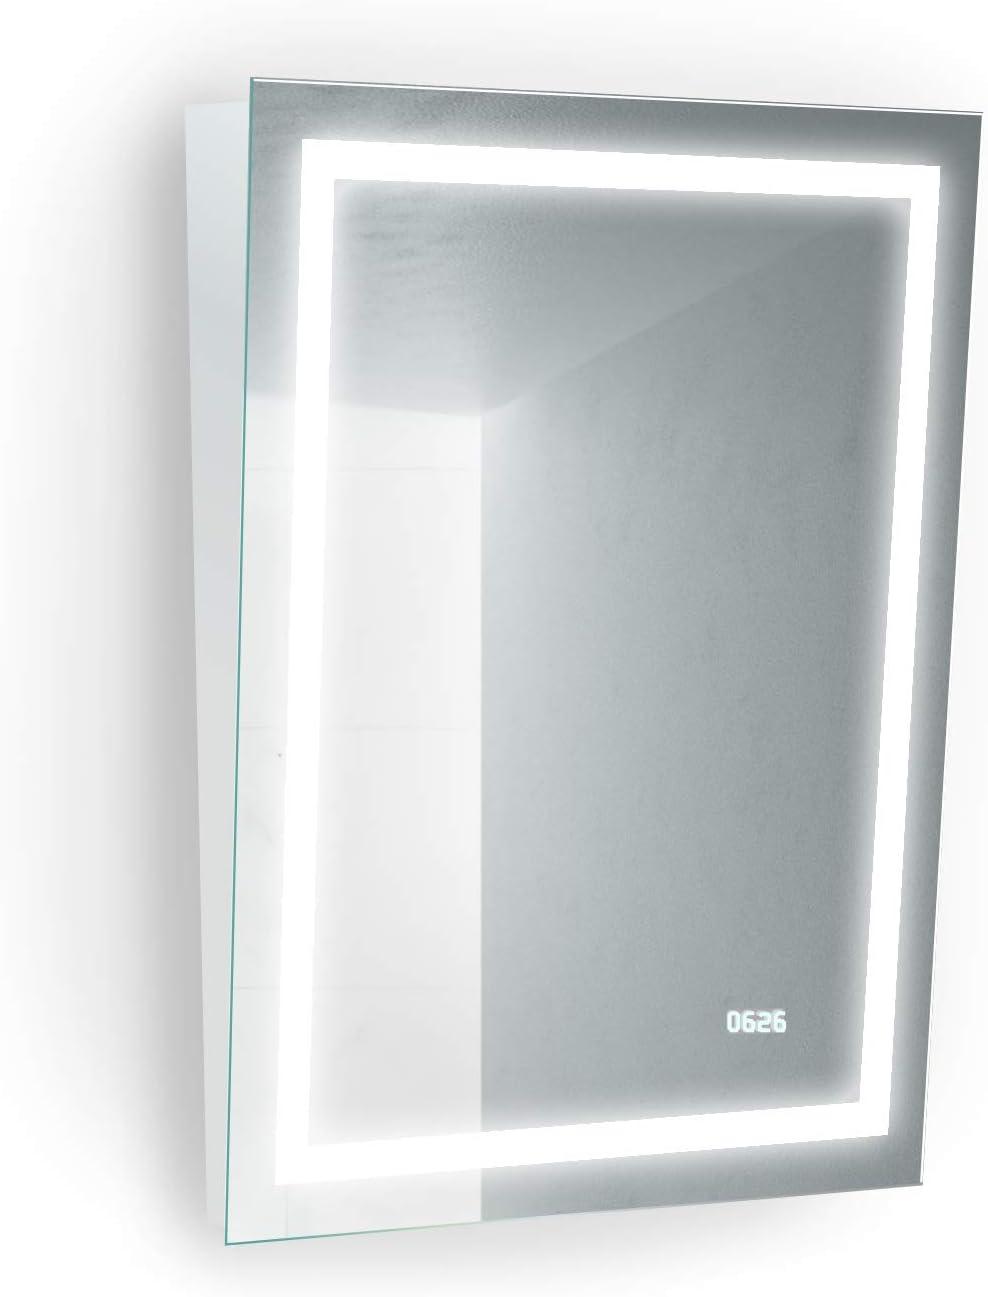 Amazon Com Krugg 24 Inch X 32 Inch Led Bathroom Mirror Ada Fixed Tilt Lighted Vanity Mirror Digital Clock 4000k Home Kitchen